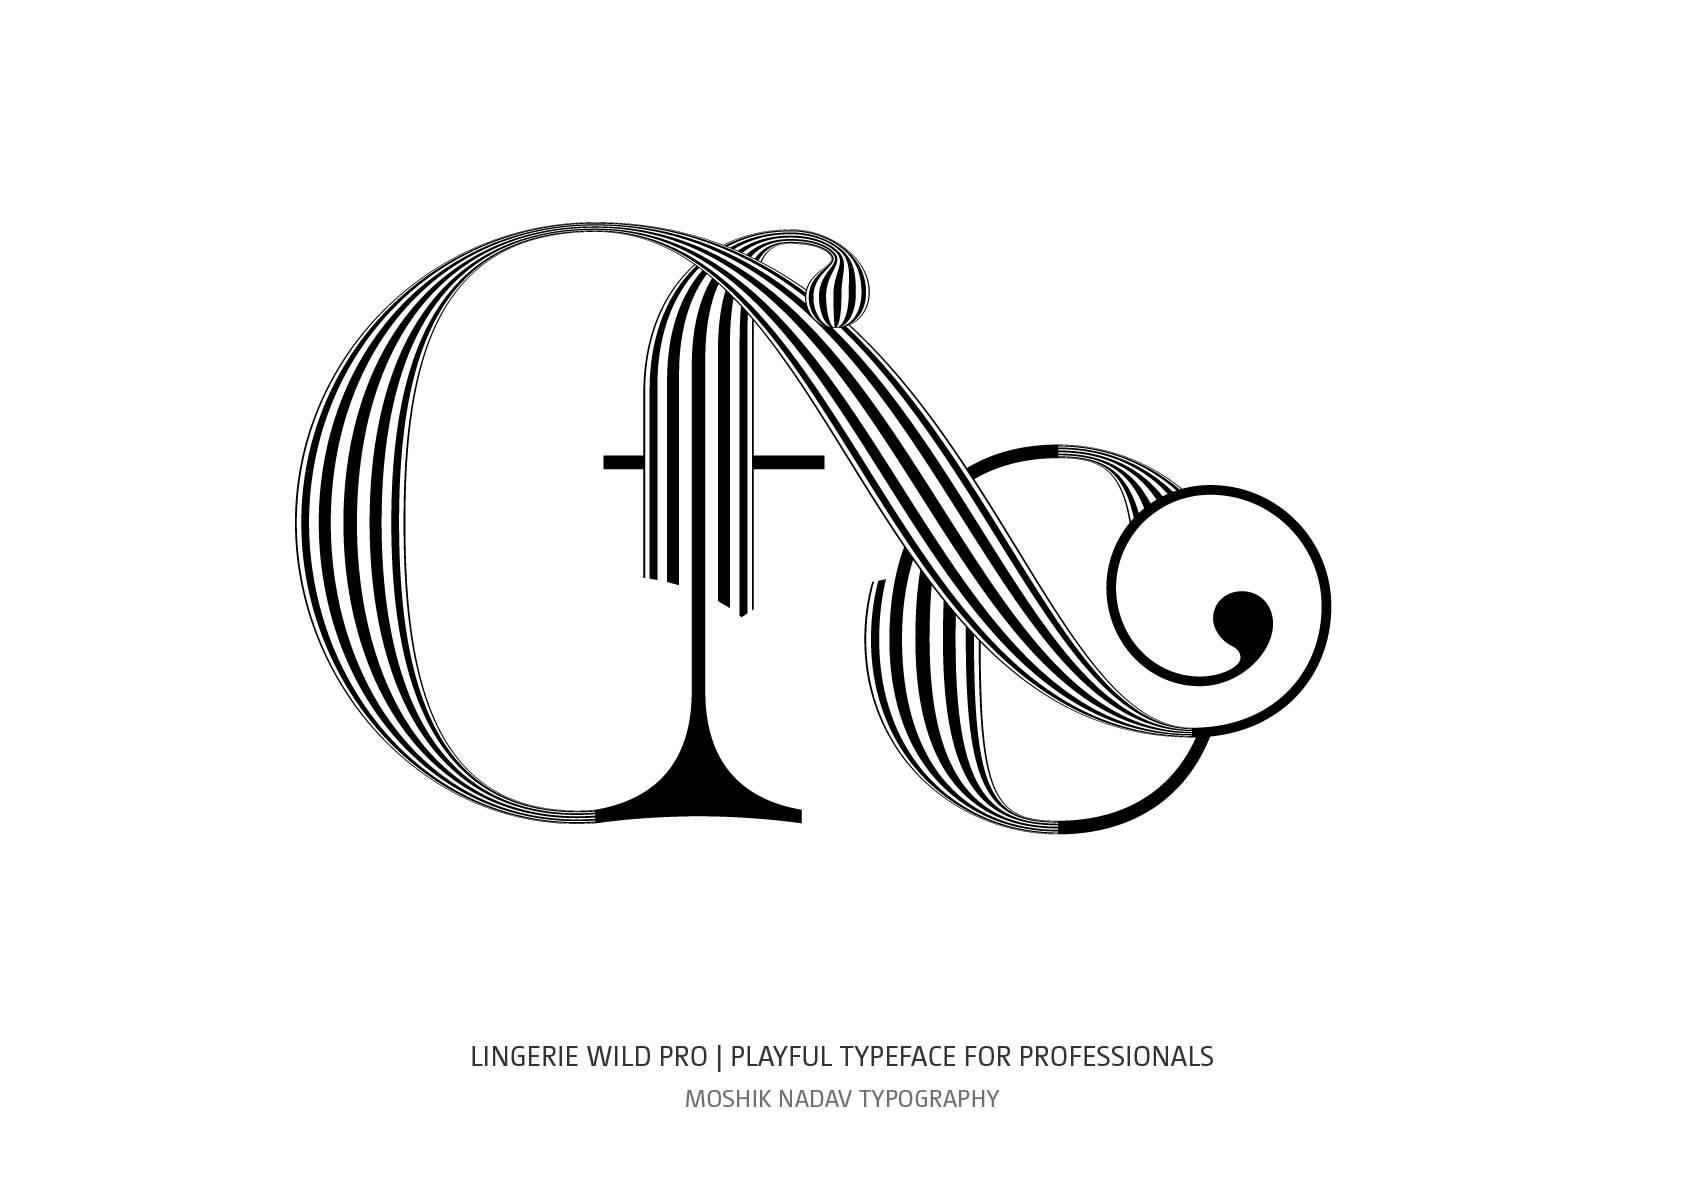 Lingerie Wild Pro typeface fo ligature by Moshik Nadav Fashion Typography NYC